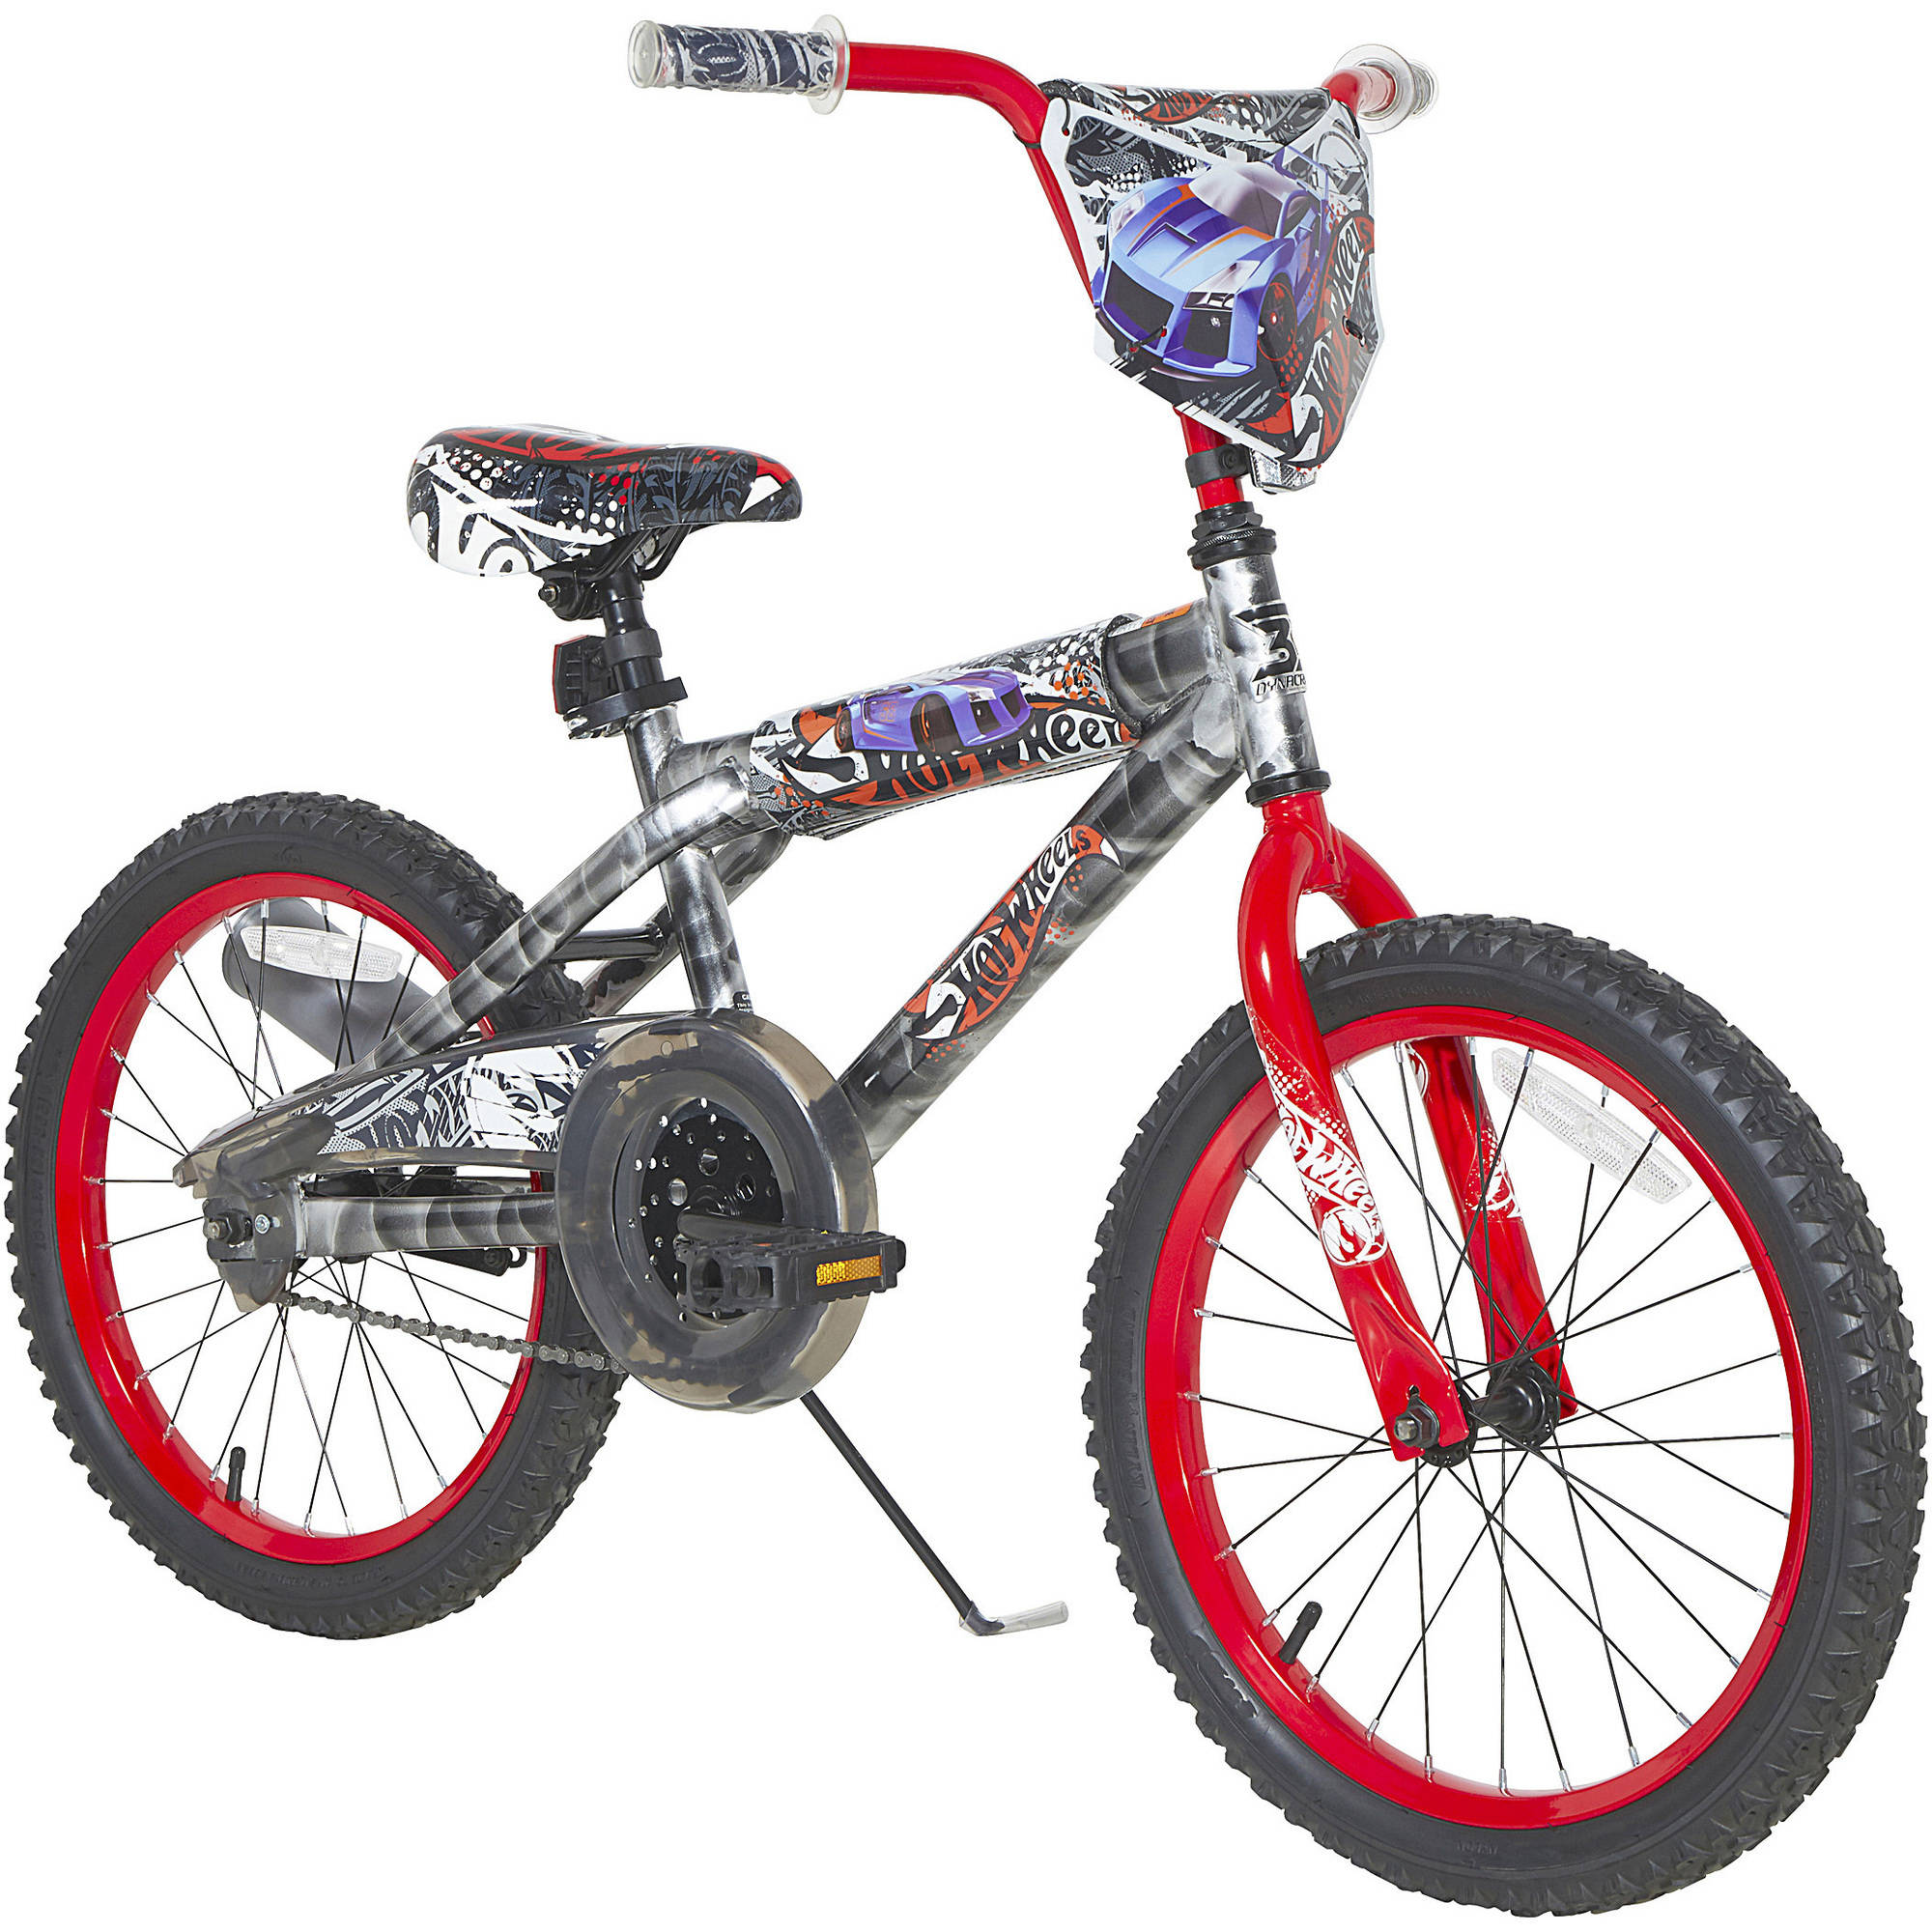 "18"" Dynacraft Hot Wheels Boys' Bike with Turbospoke"